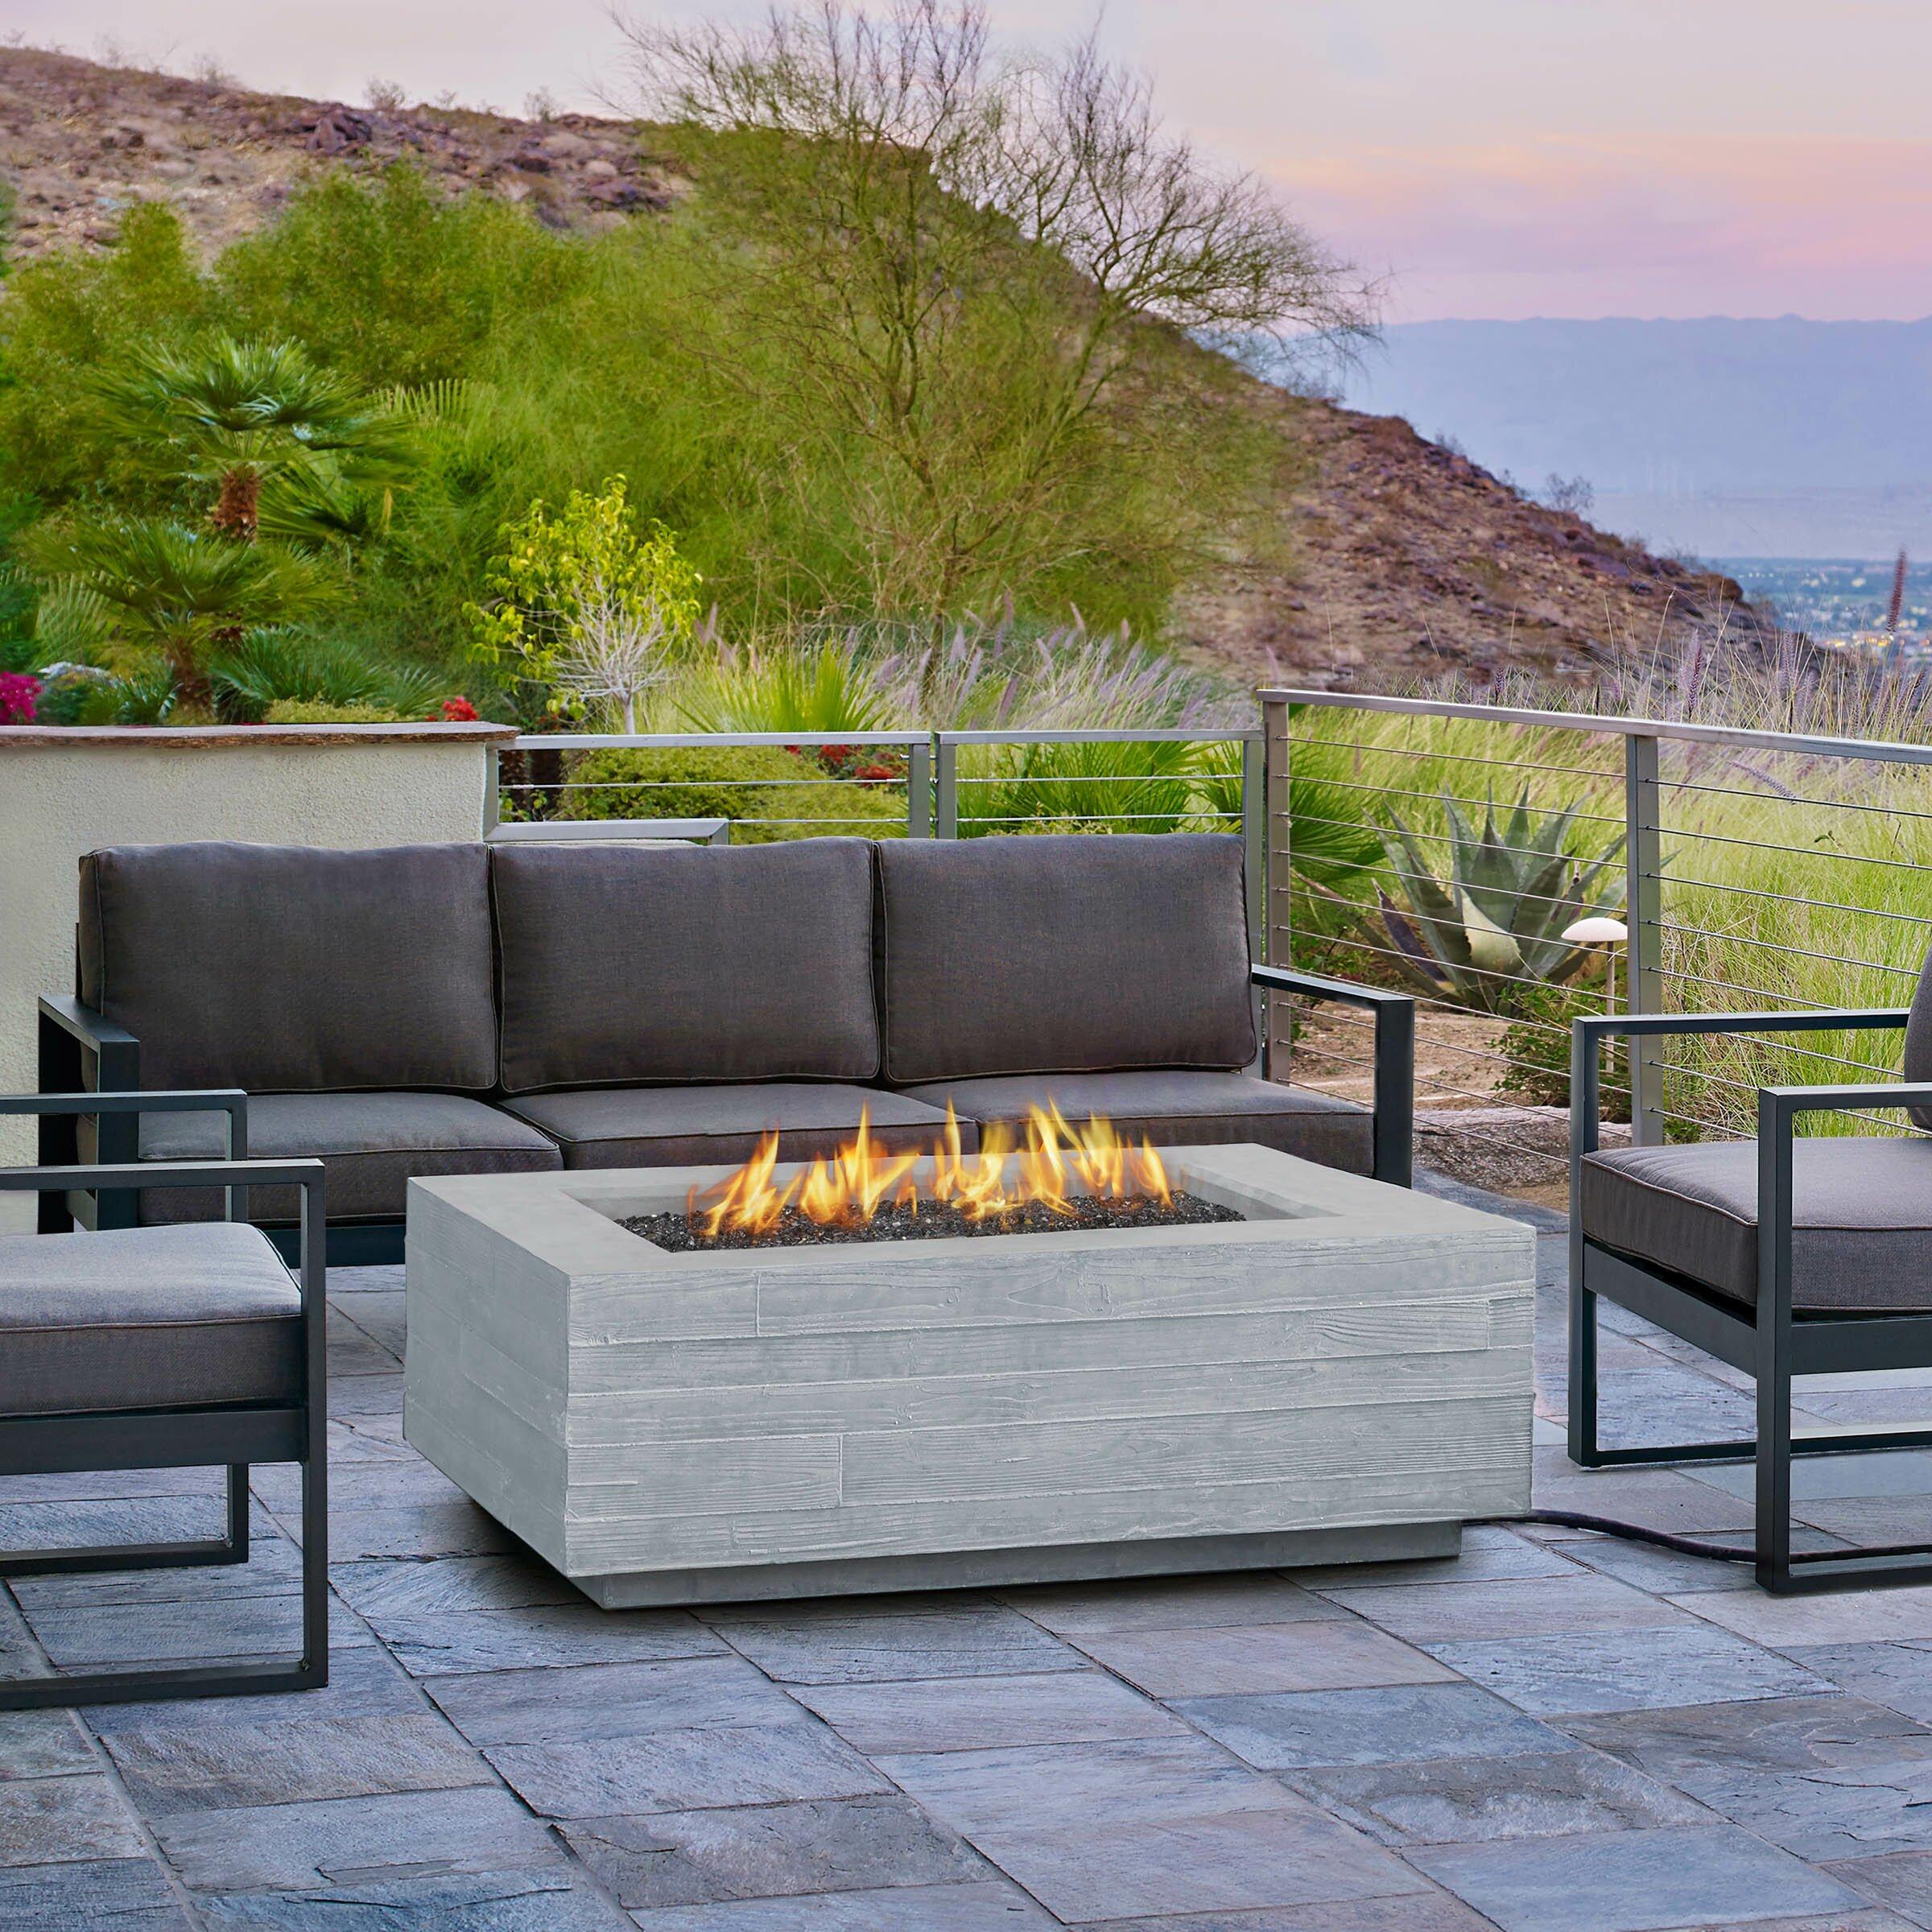 title | Patio Propane Fireplace Outdoor Decor